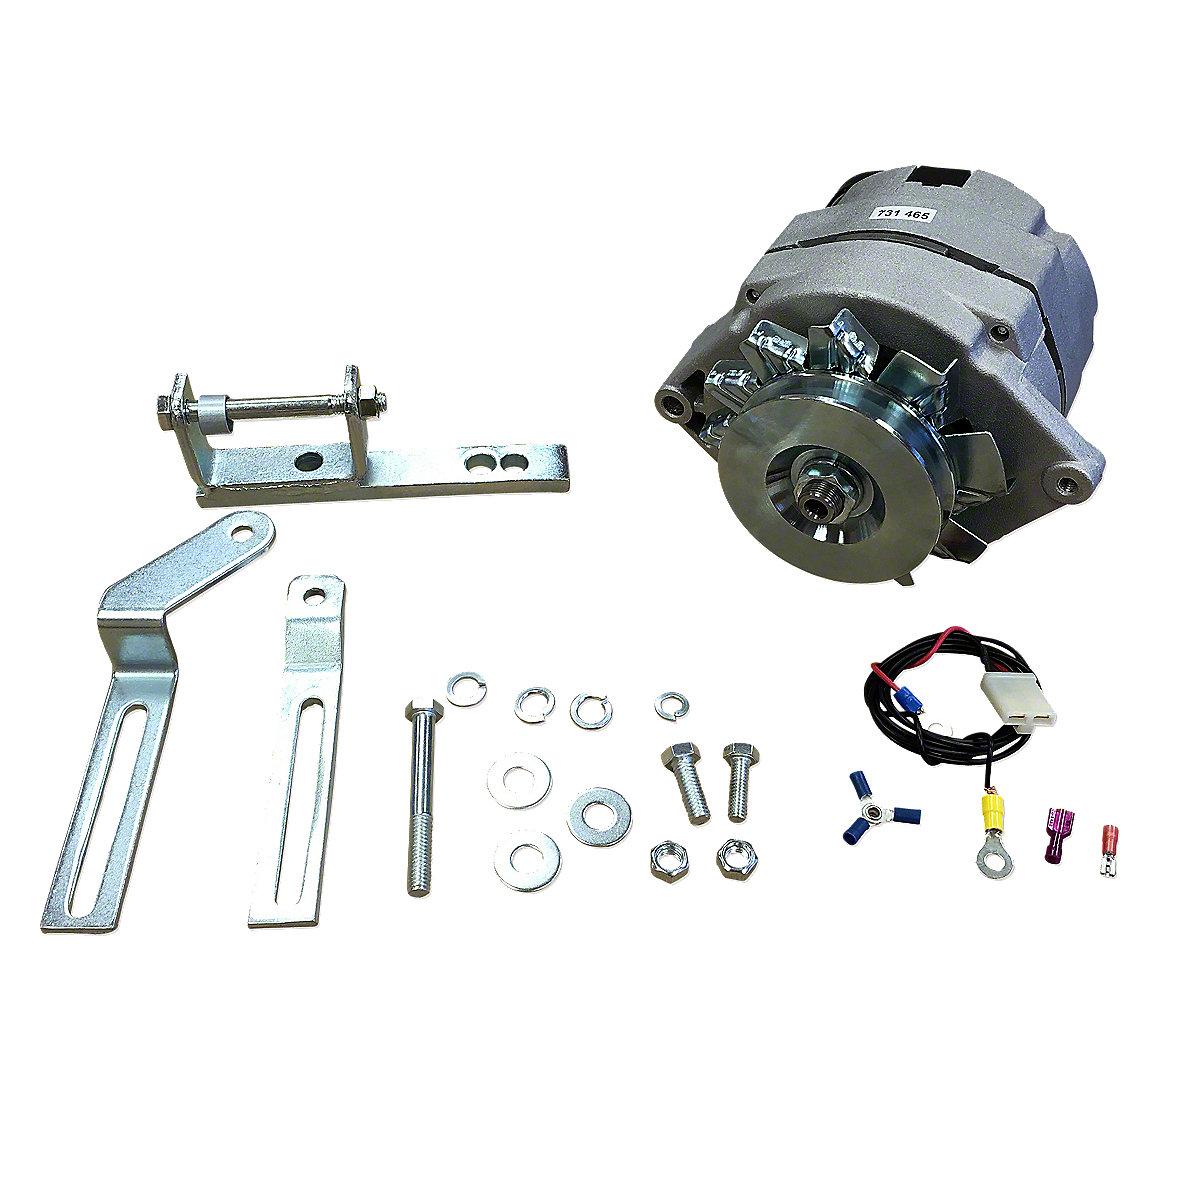 alternator conversion kit for negative ground systems fds3466